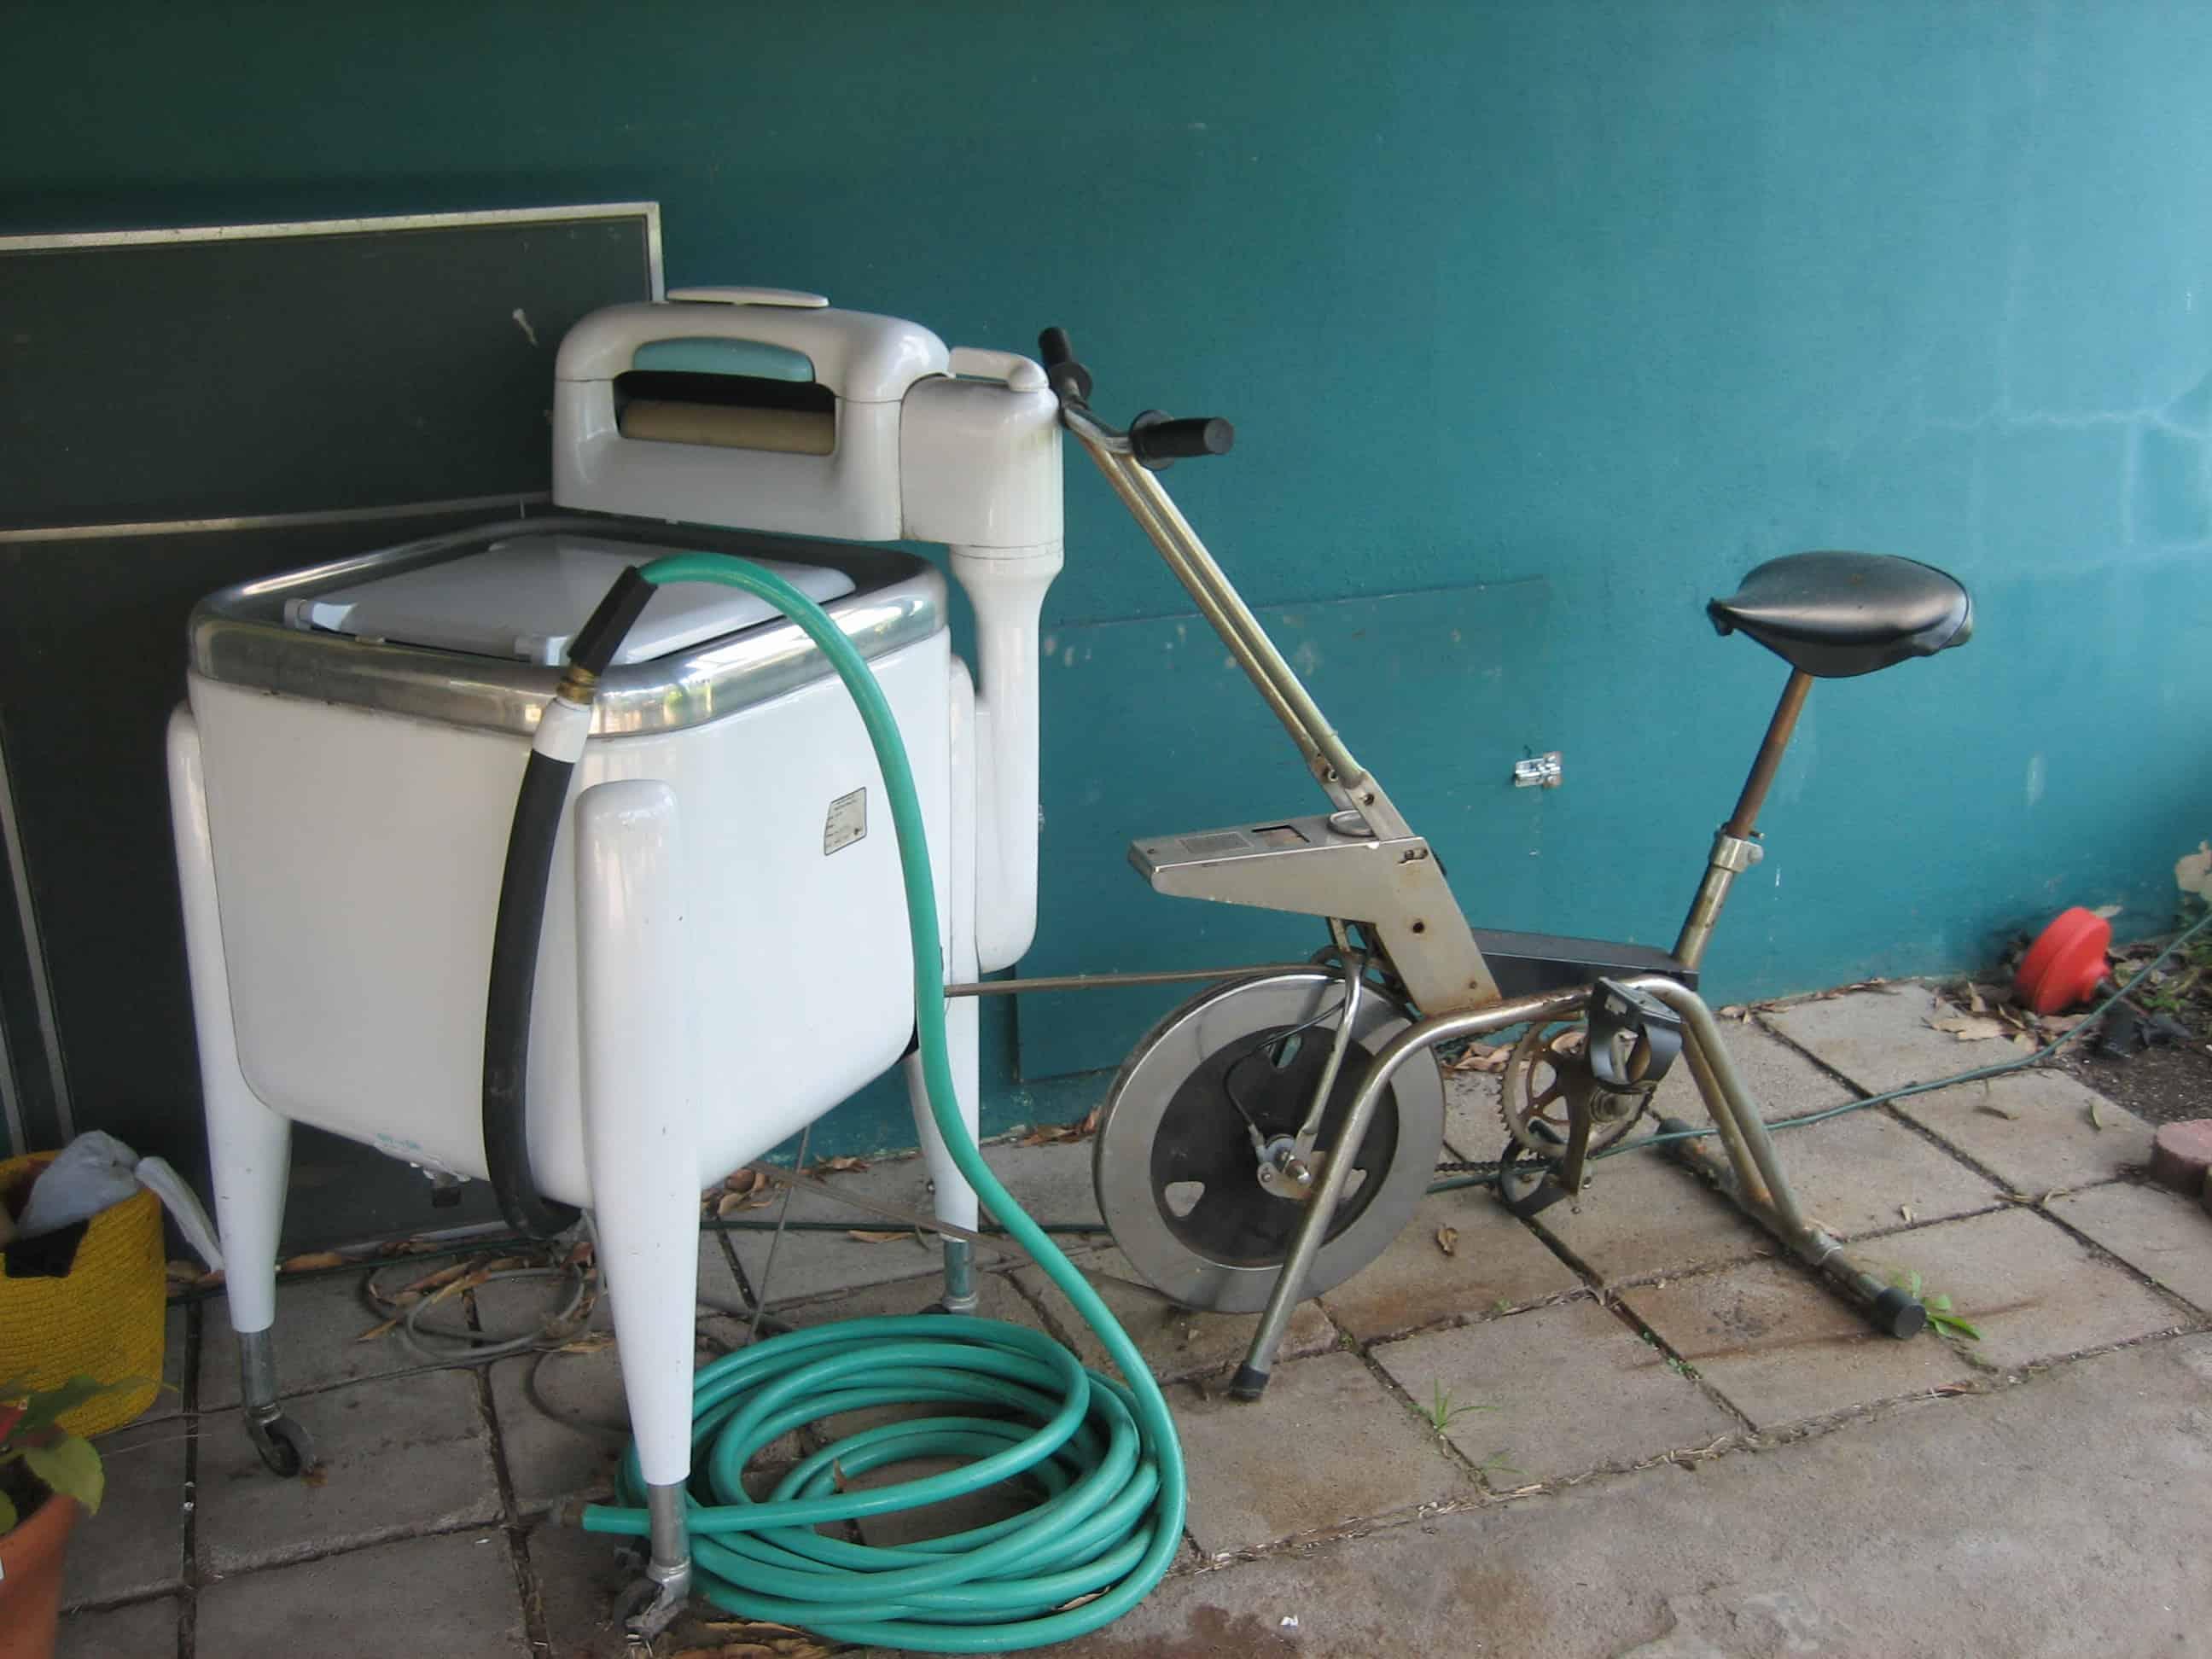 pedal washer machine